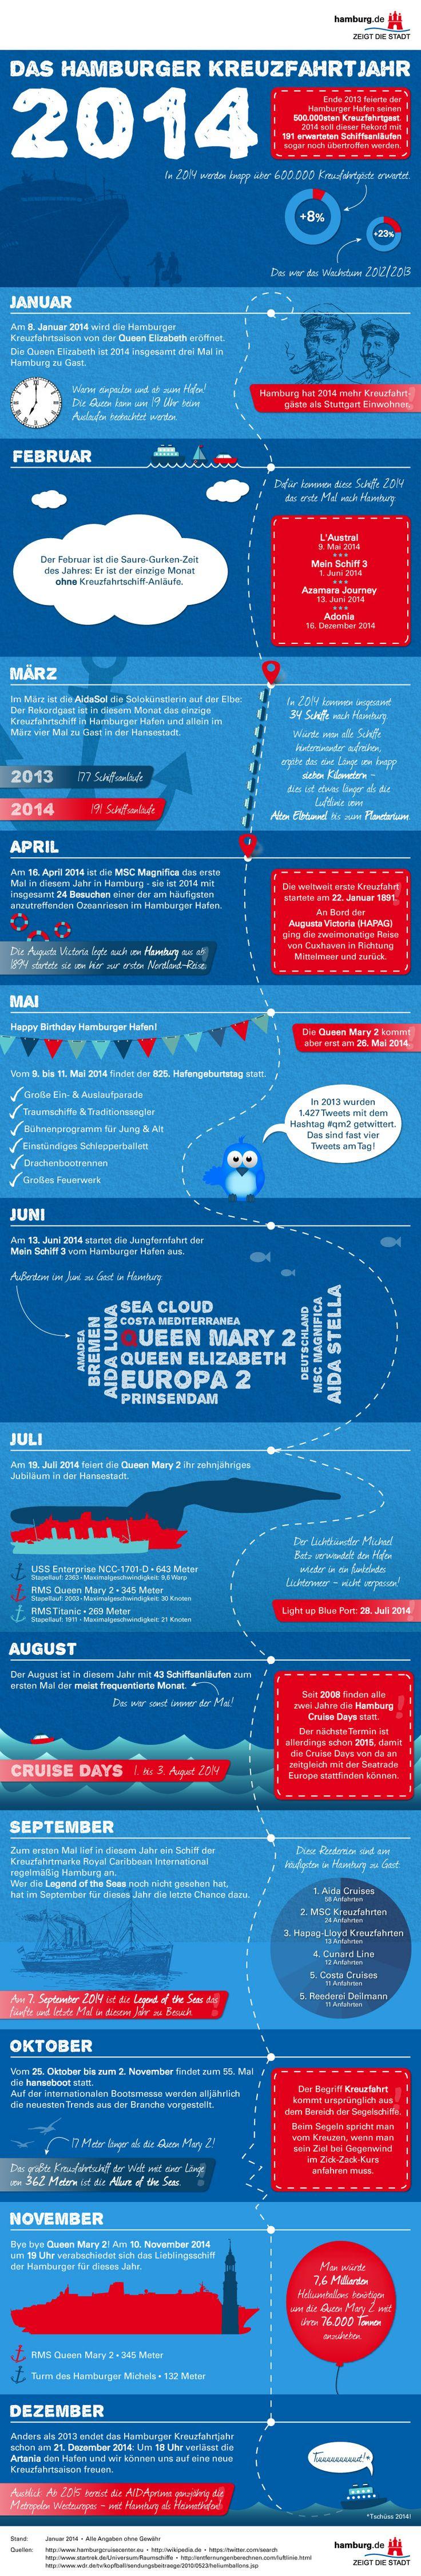 Das Hamburger Kreuzfahrtjahr 2014 [Infografik] - hamburg.de